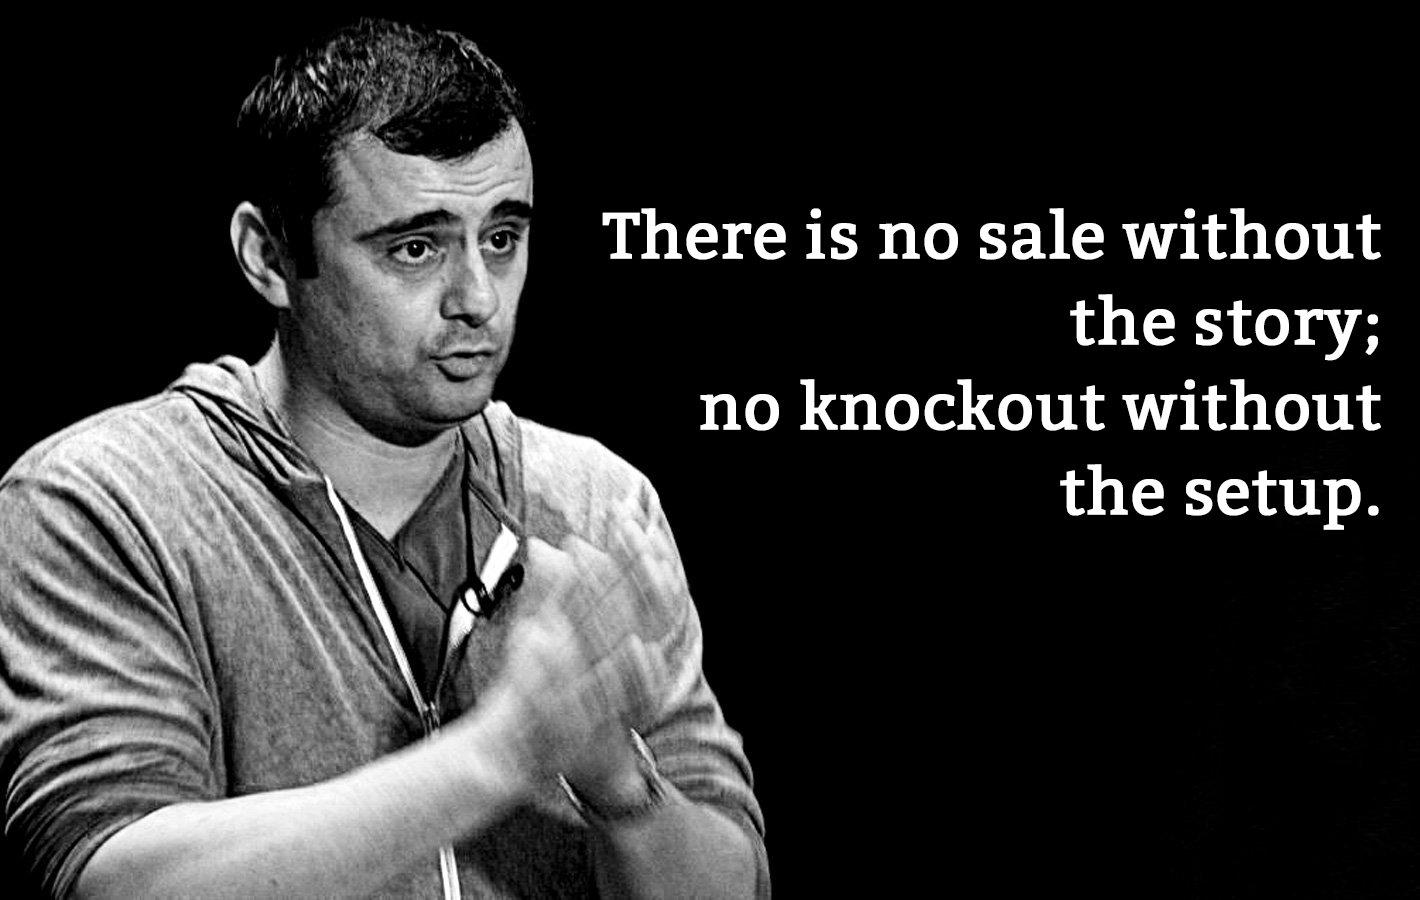 Quote by Gary Vaynerchuk from Jab, Jab, Jab, Right Hook